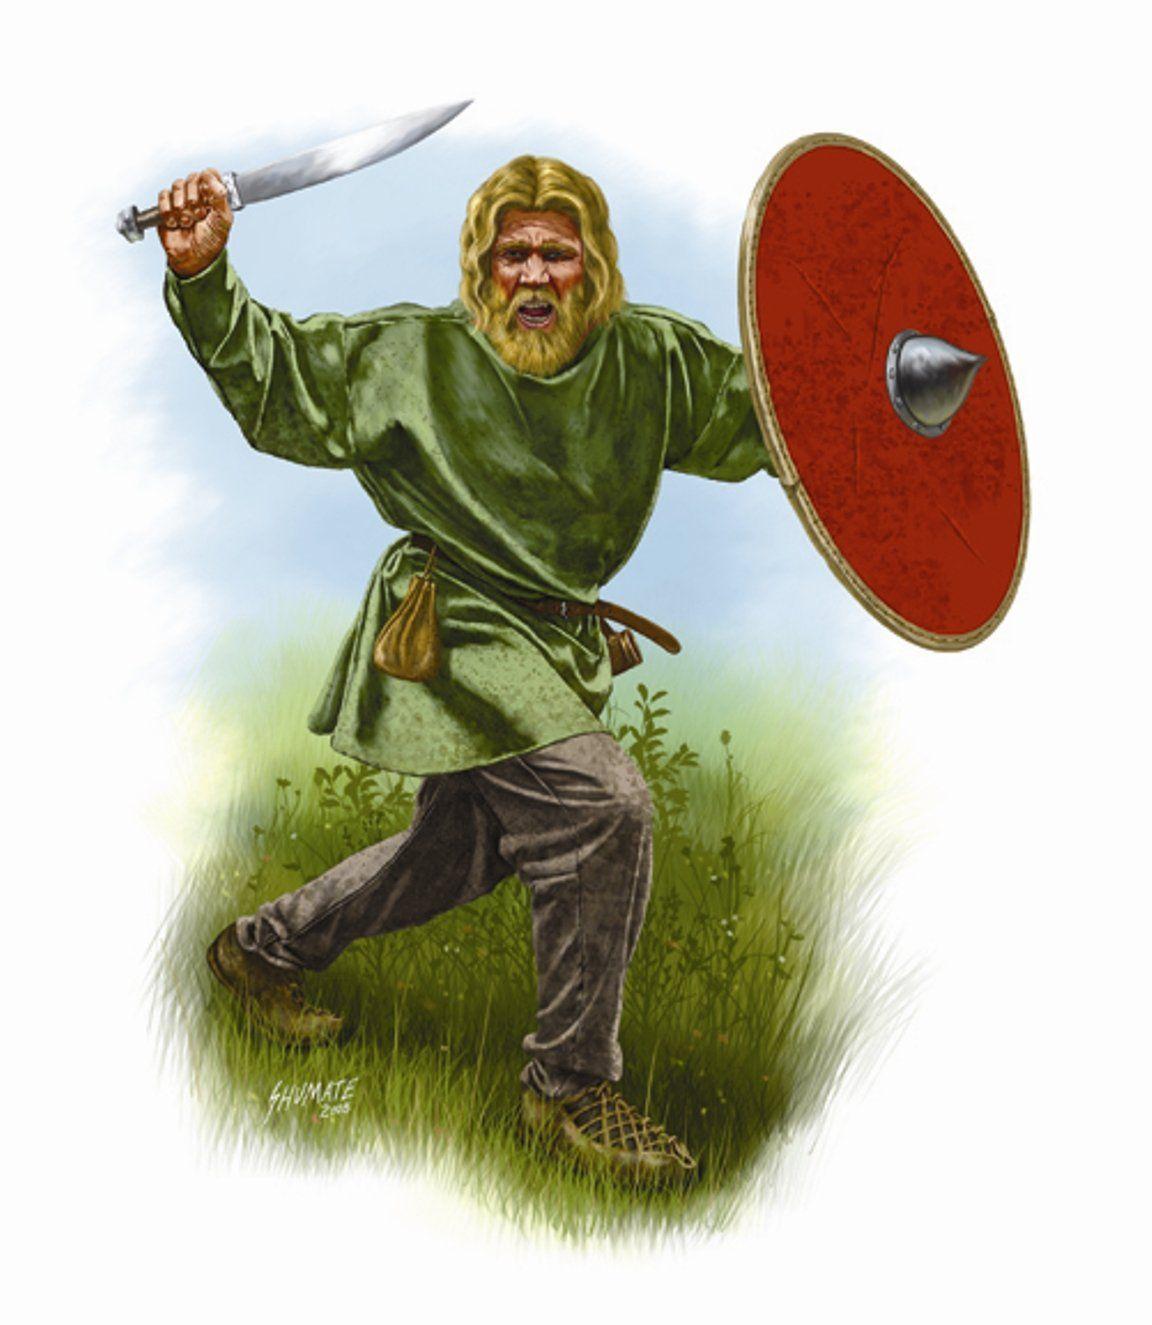 Saxon Warrior by Johnny Shumate